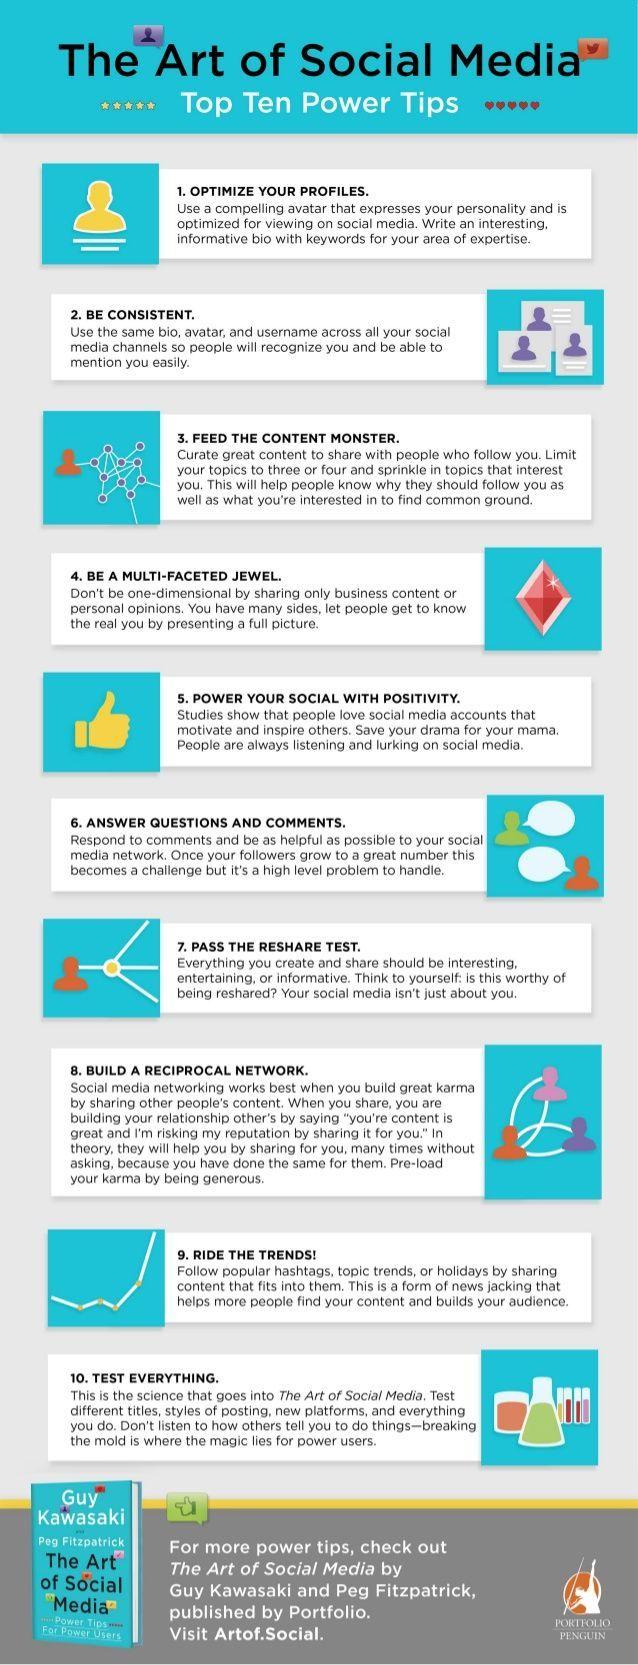 10 Power Tips to Master the Art of Social Media